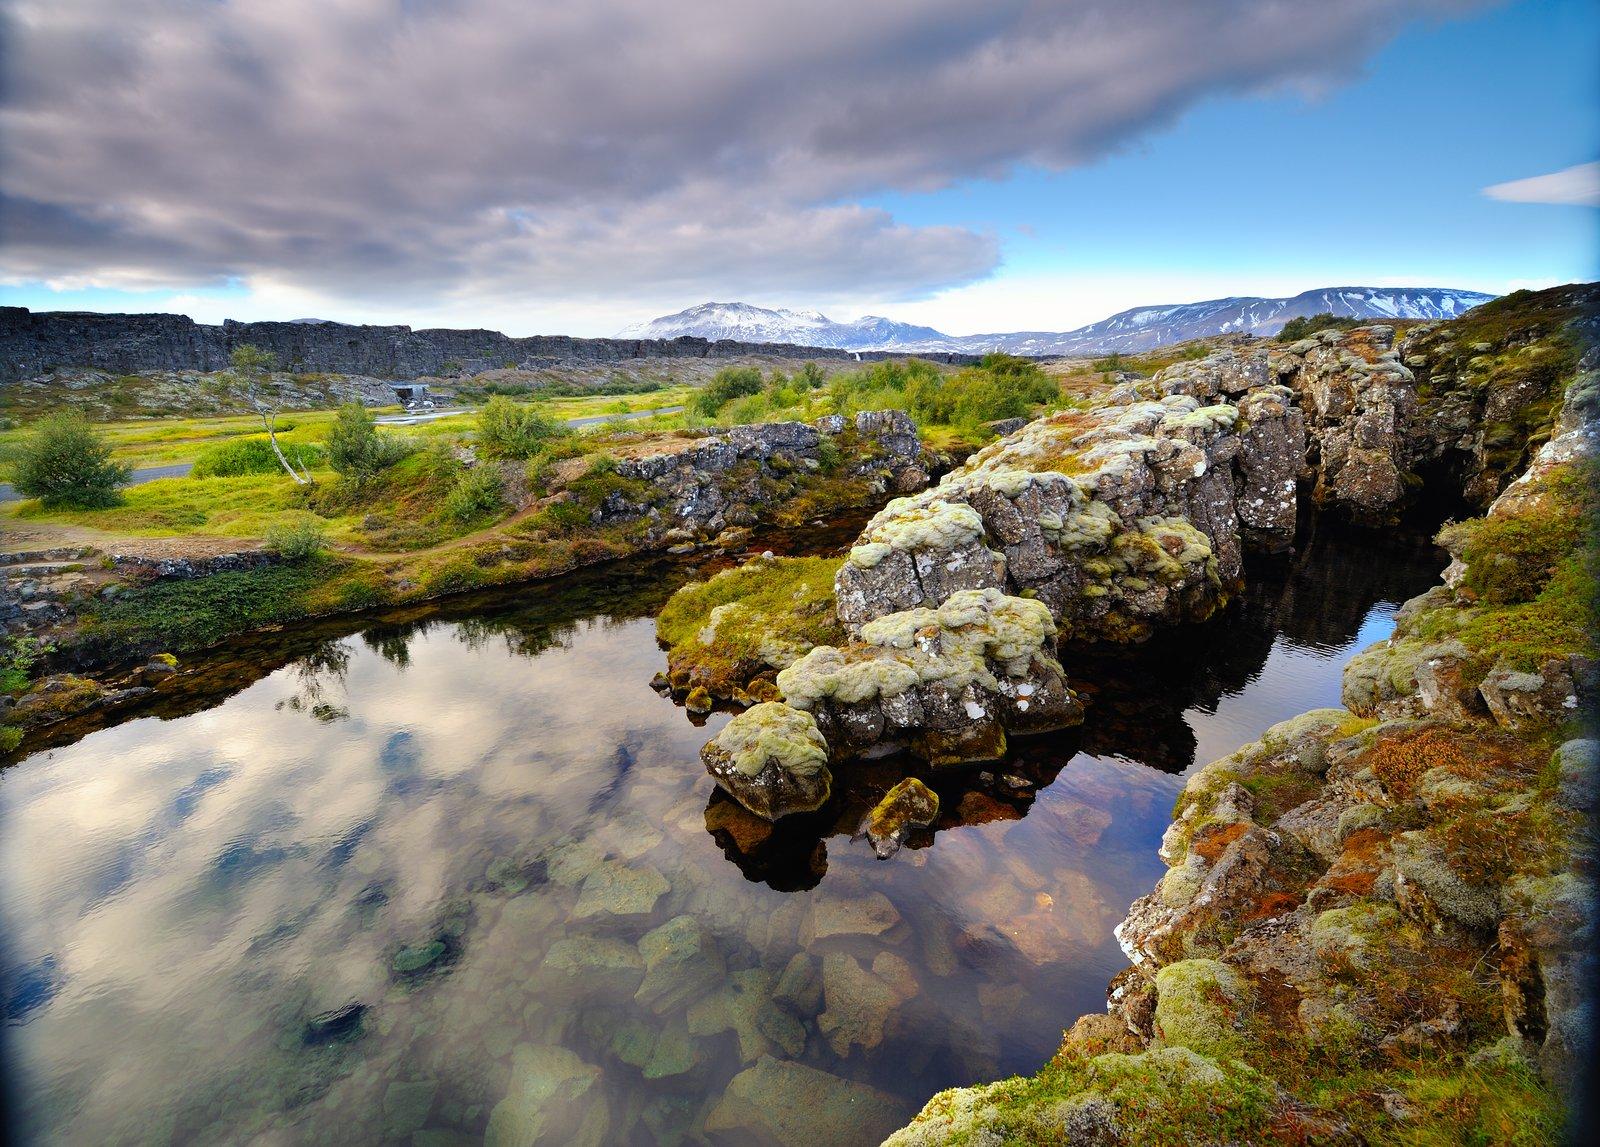 Thingvellir National Park, Iceland (Eyrie)